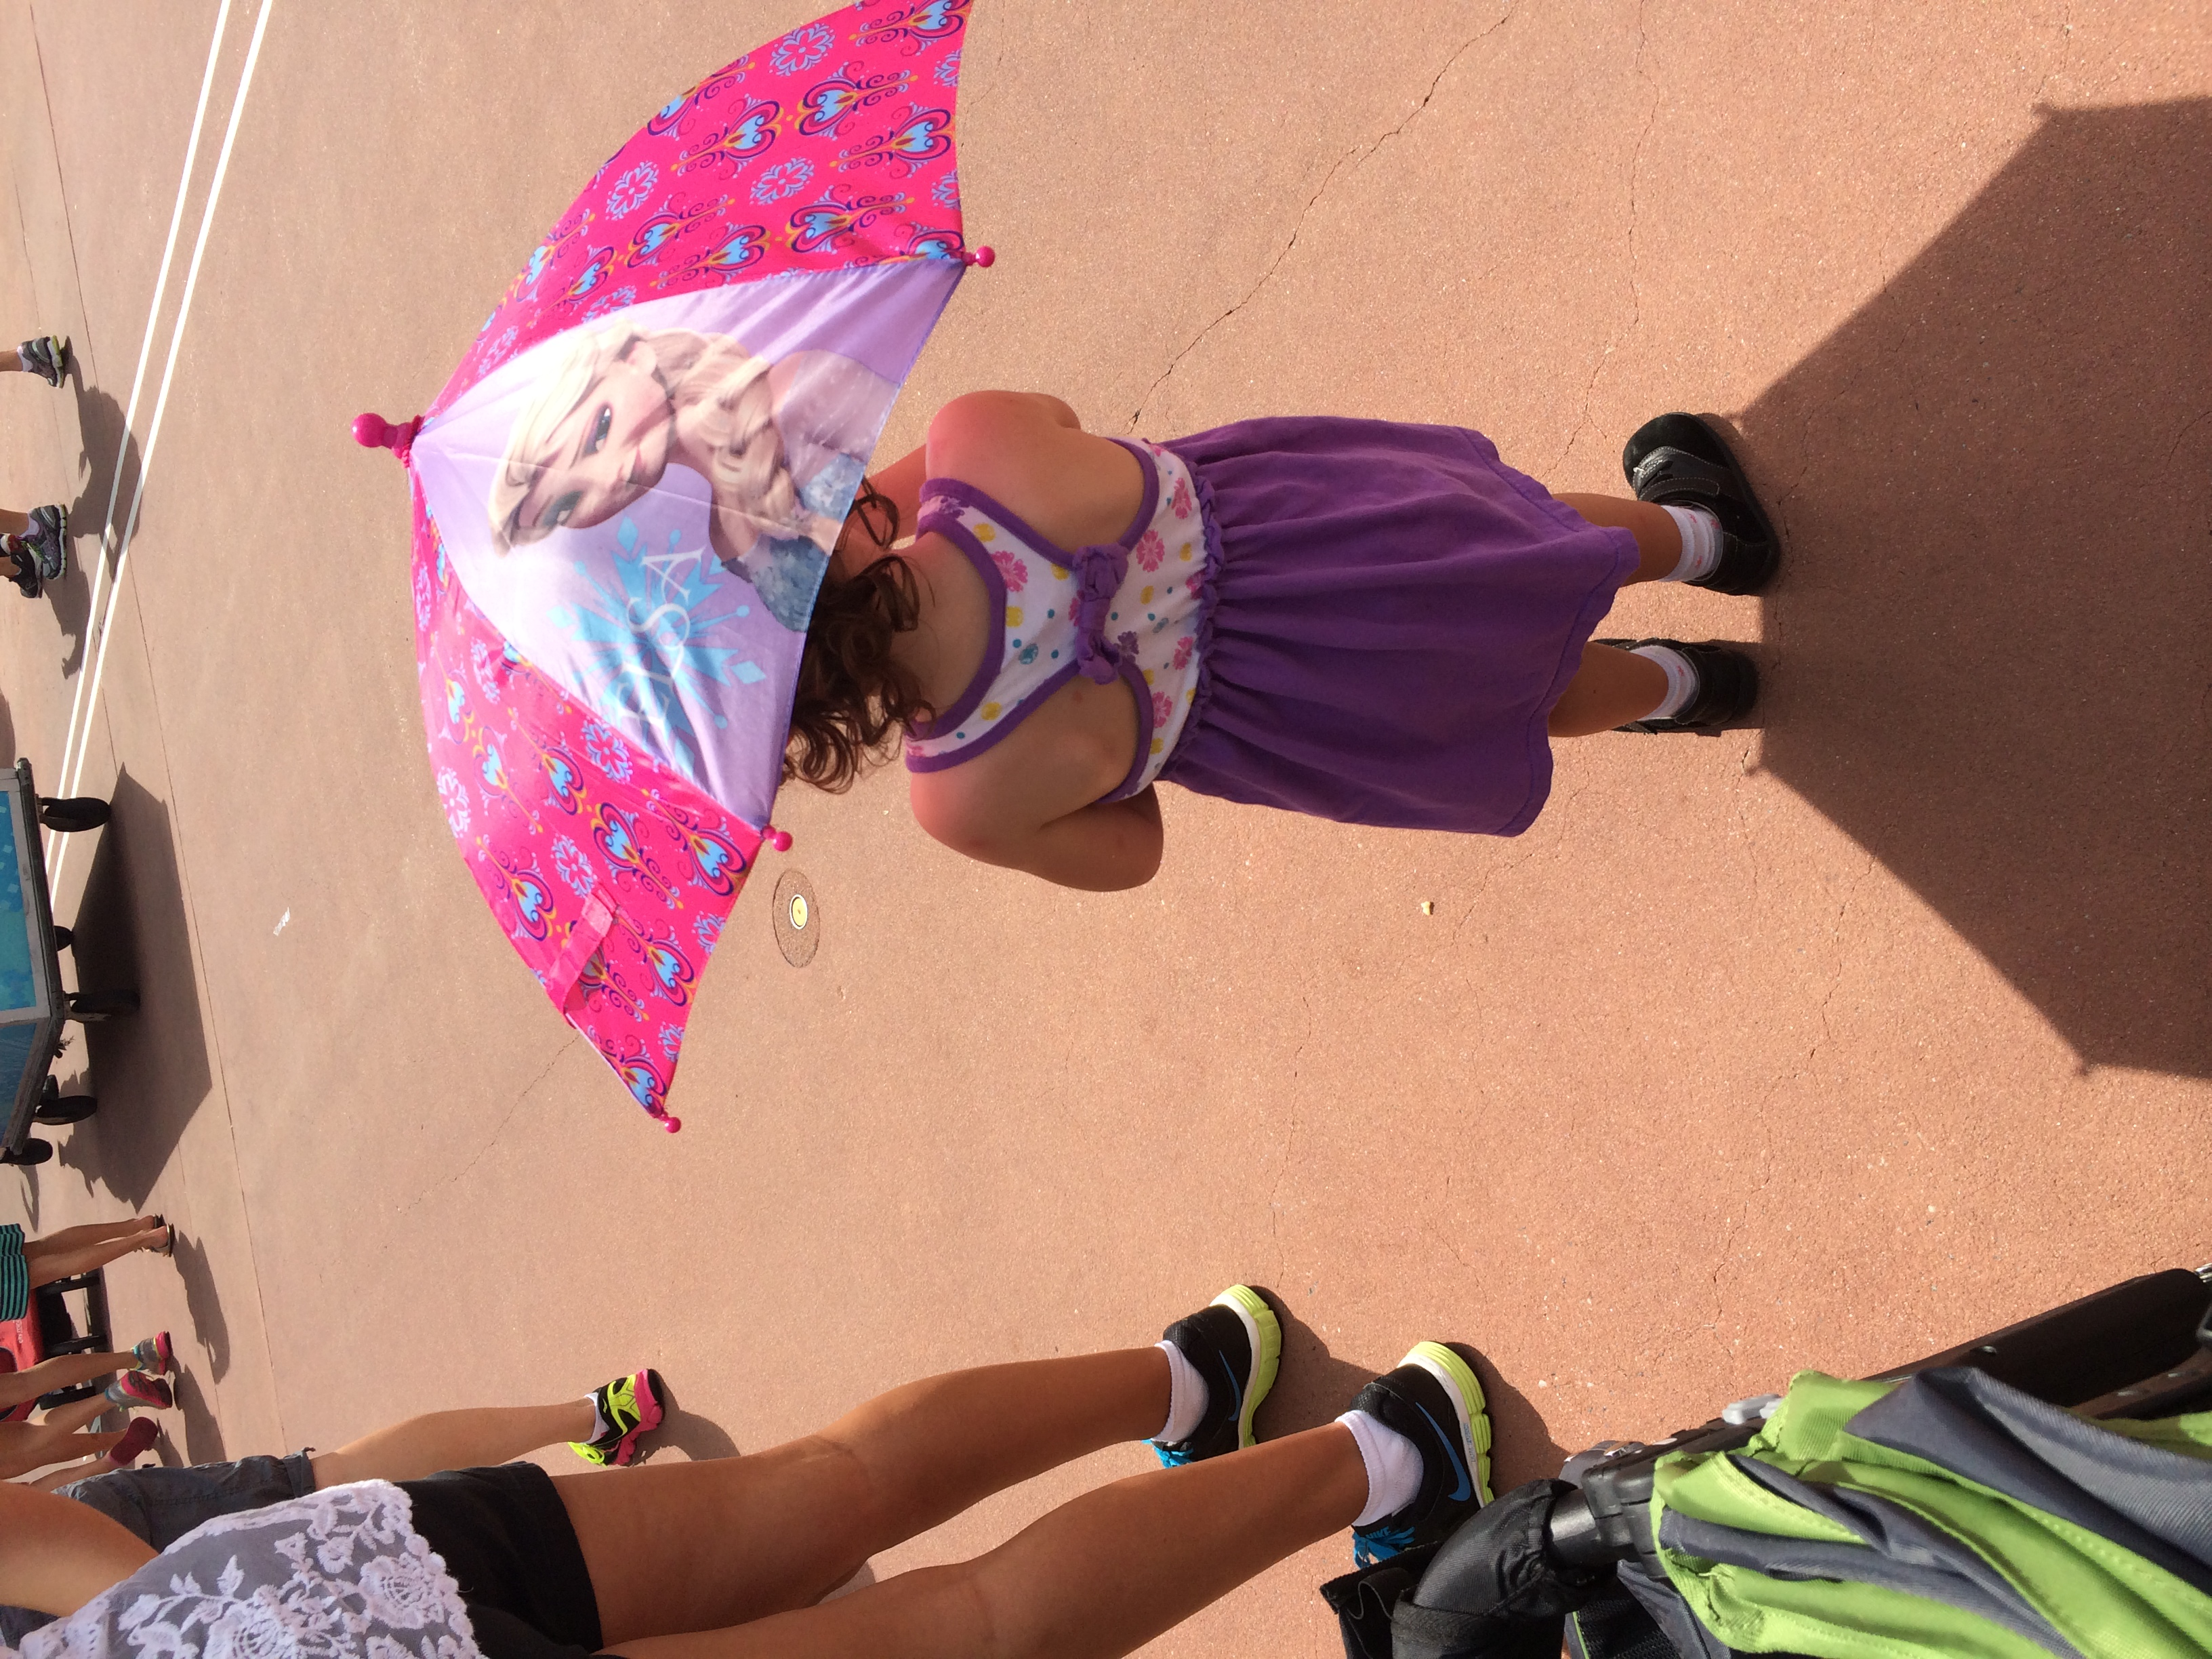 Beware the ramming Umbrella